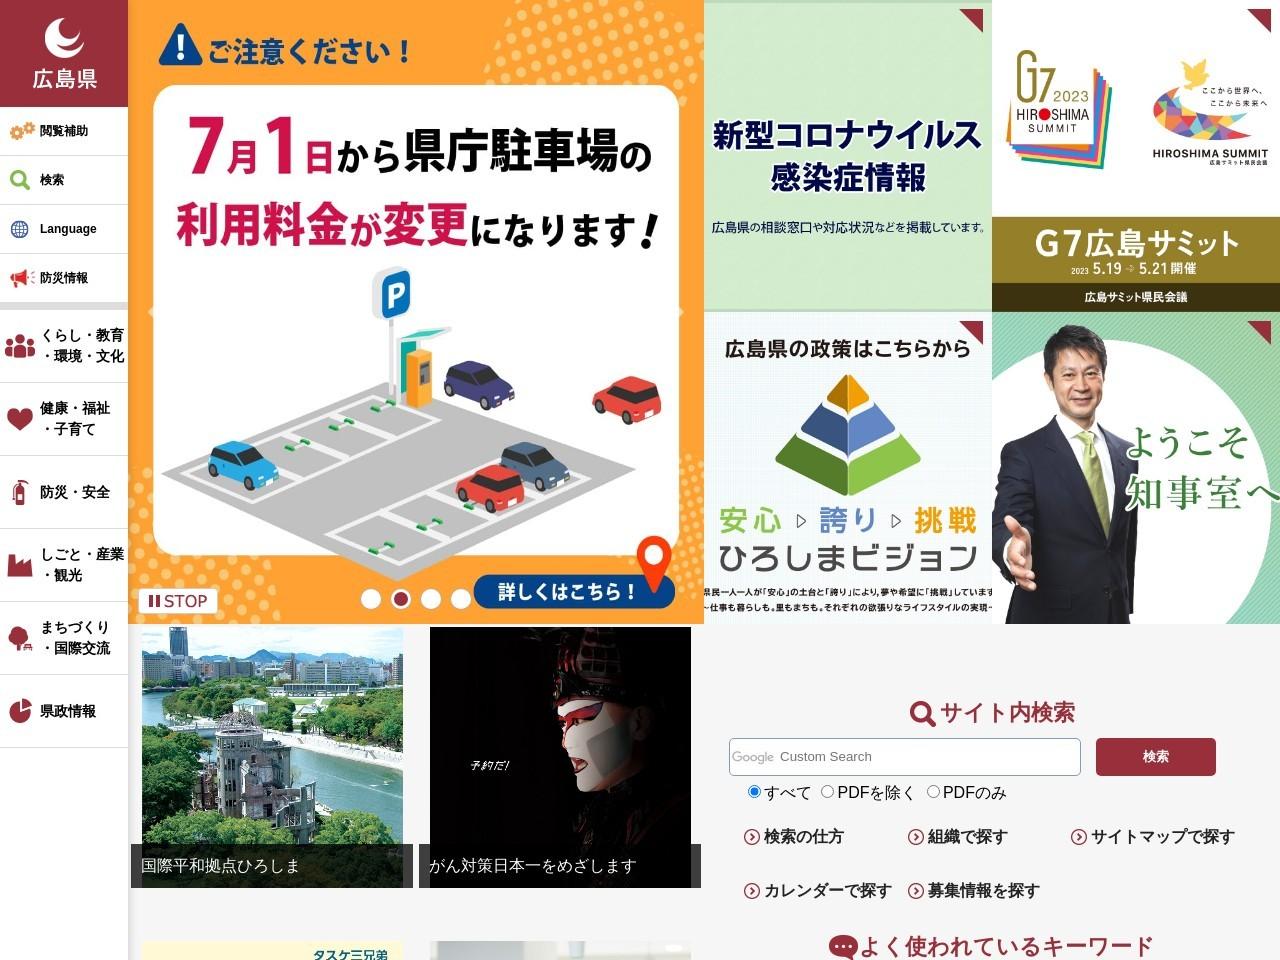 http://www.pref.hiroshima.lg.jp/soshiki/42/festa2017kokuchi.html